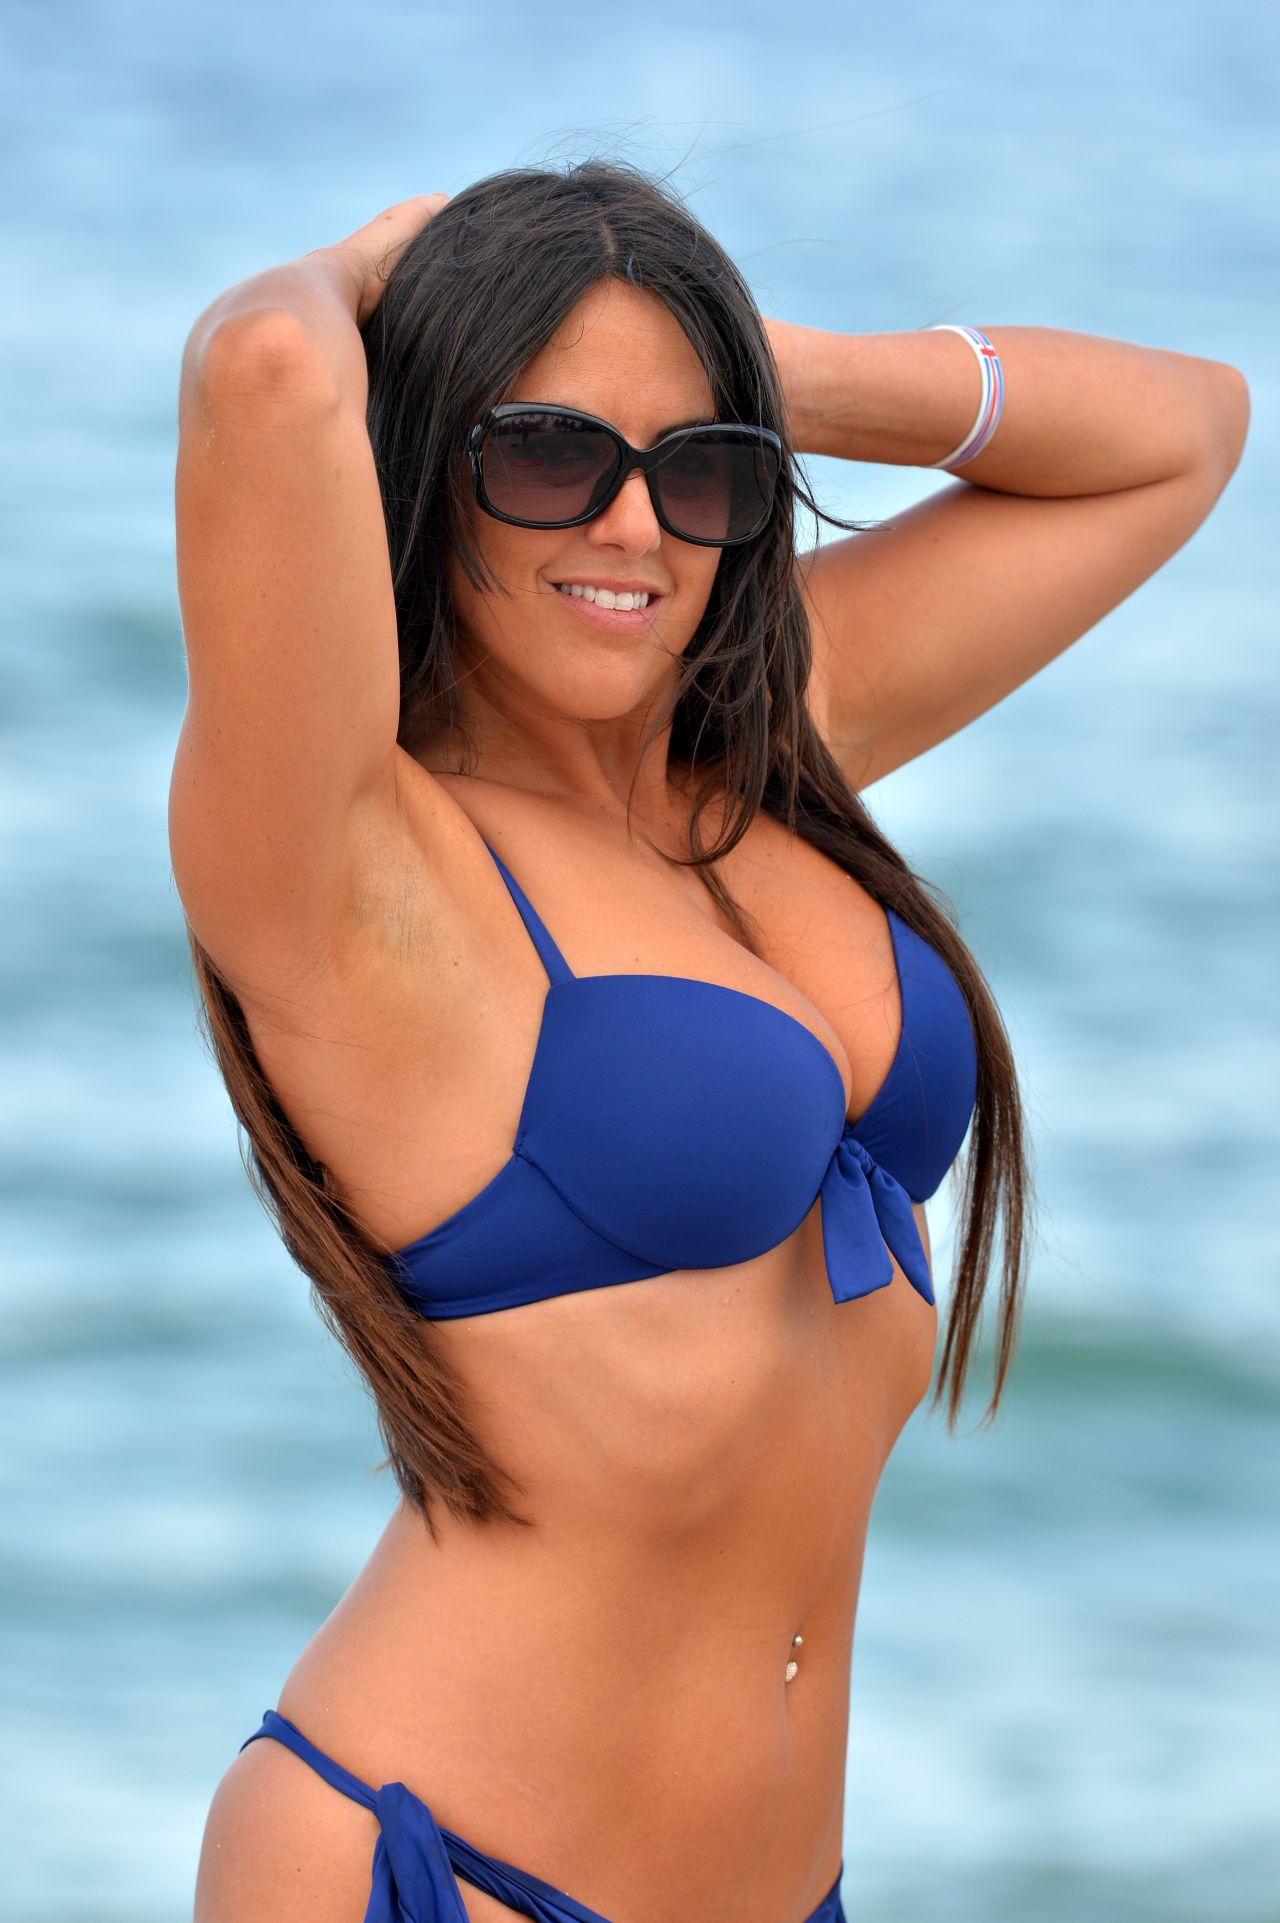 Claudia Romani In Bikini - Does Yoga In West Palm Beach -7354